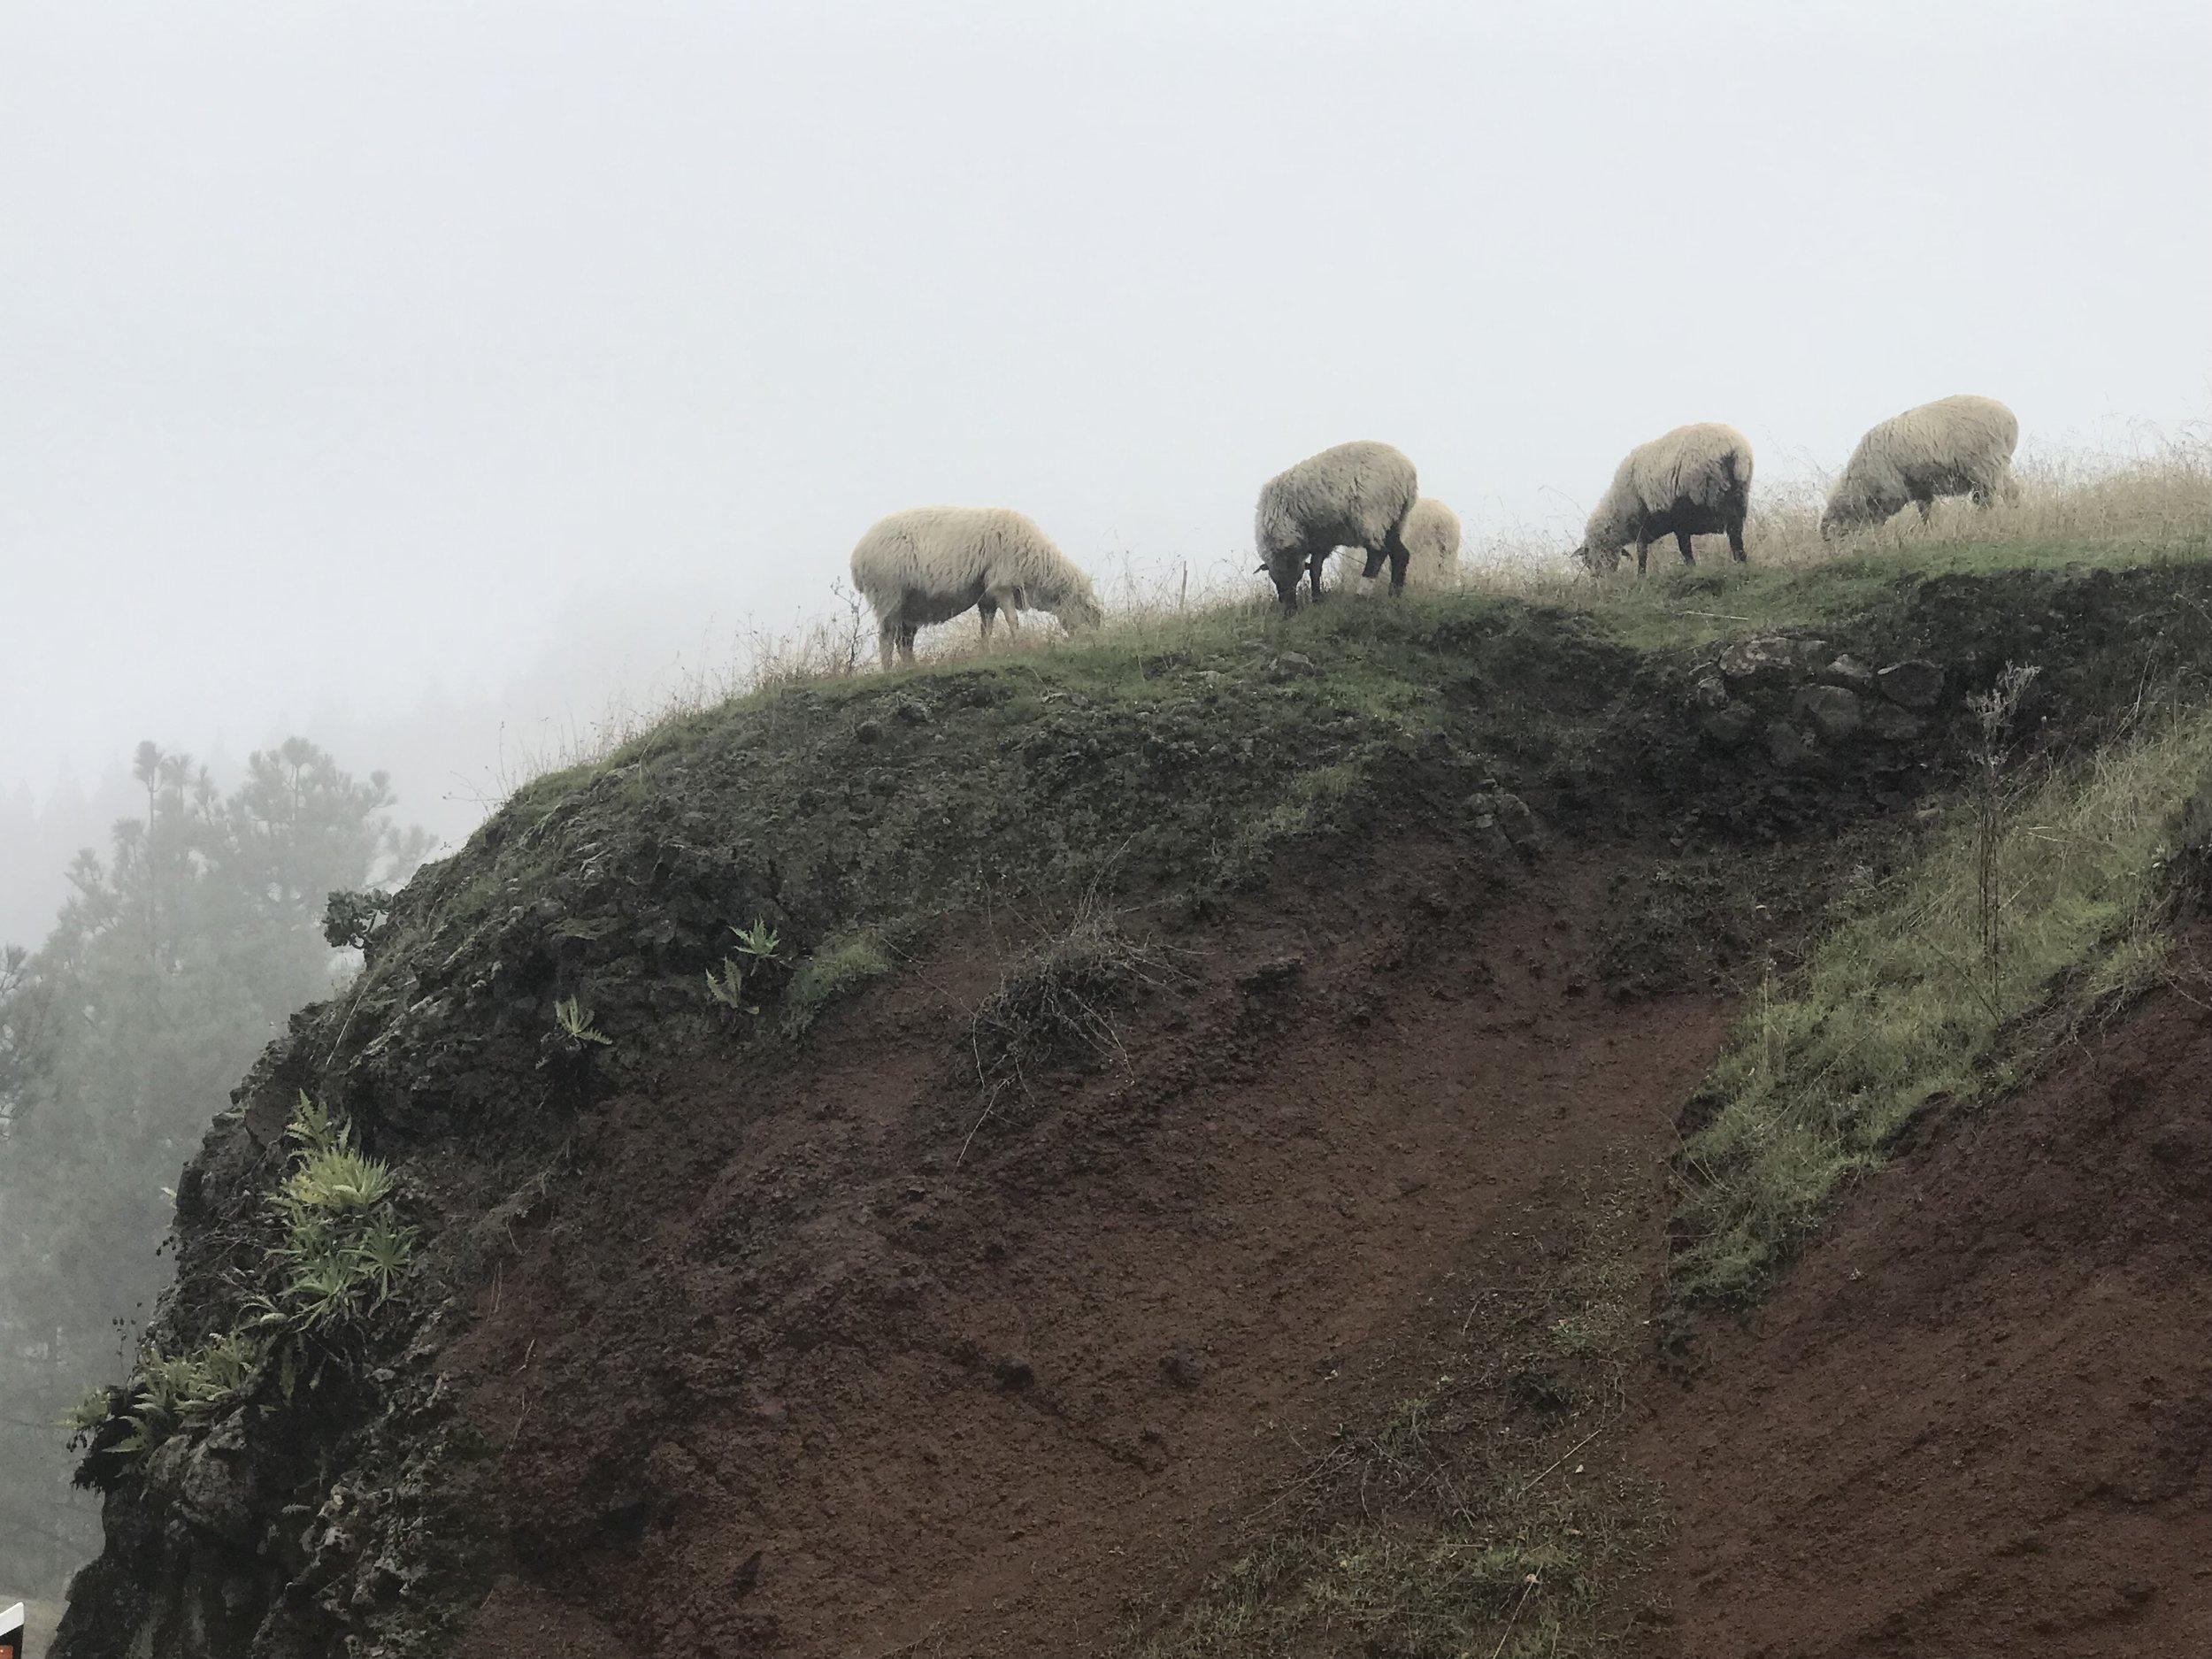 The sheep of Gran Canaria